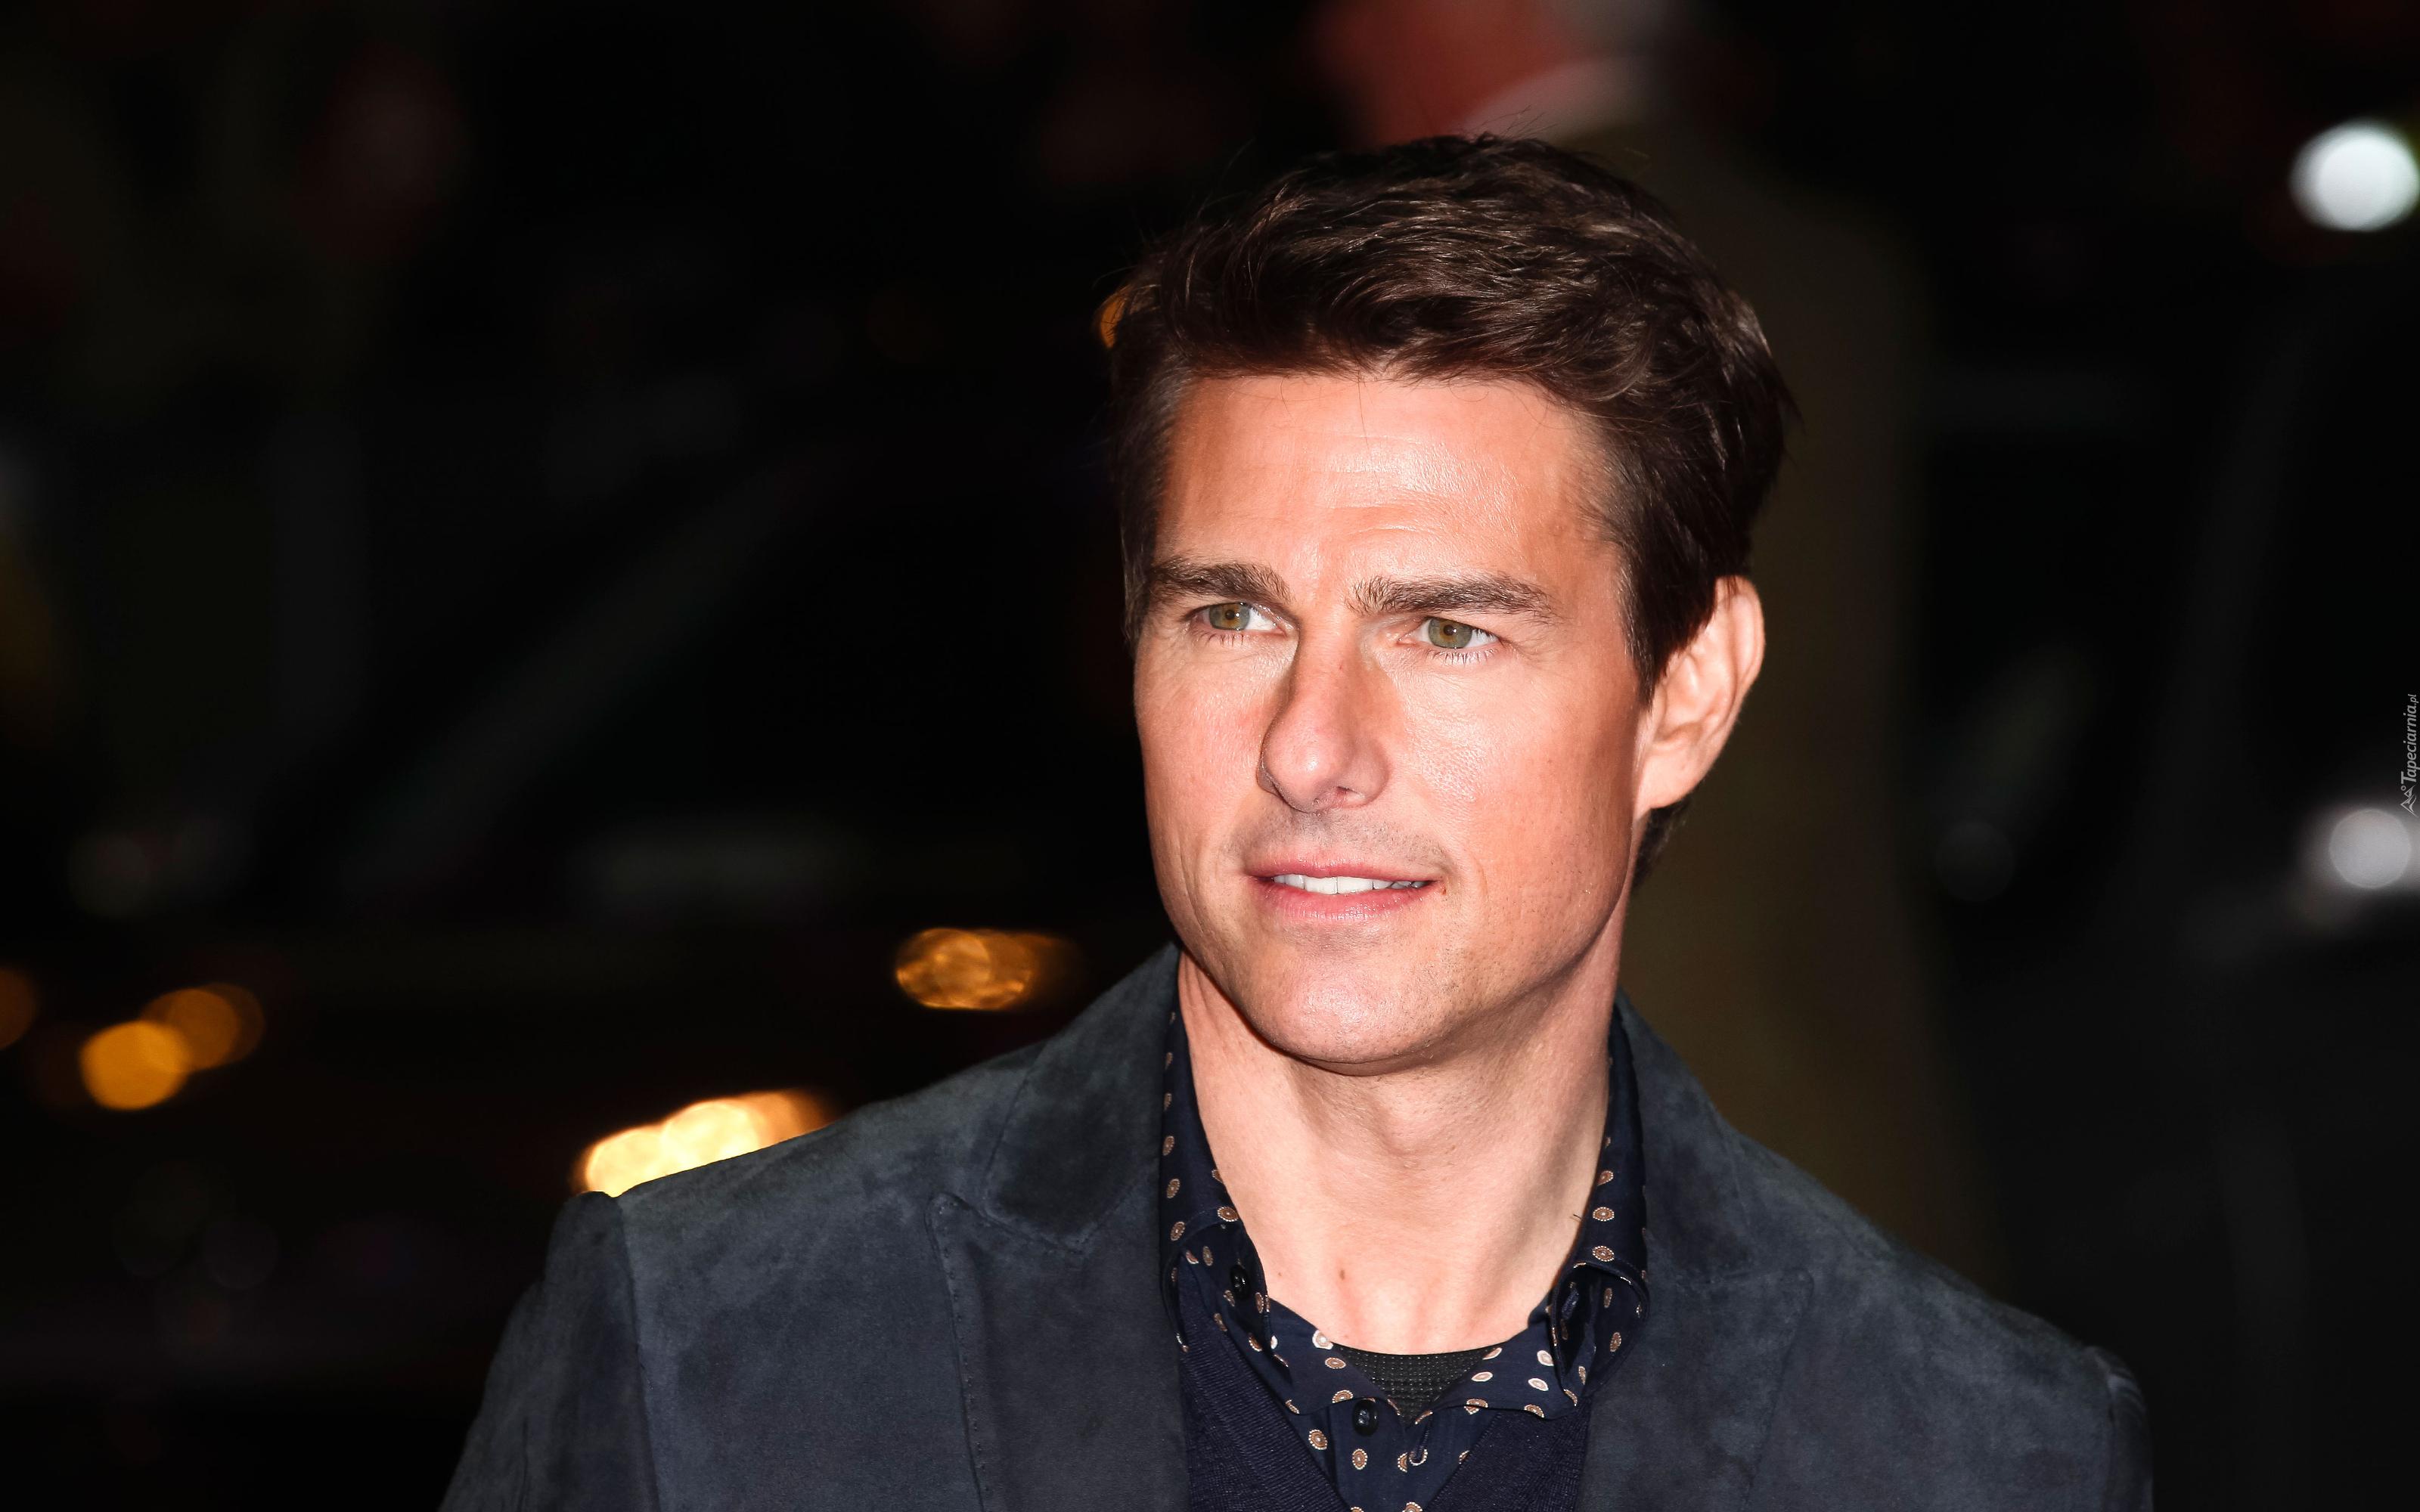 Amerykański aktor i producent Tom Cruise